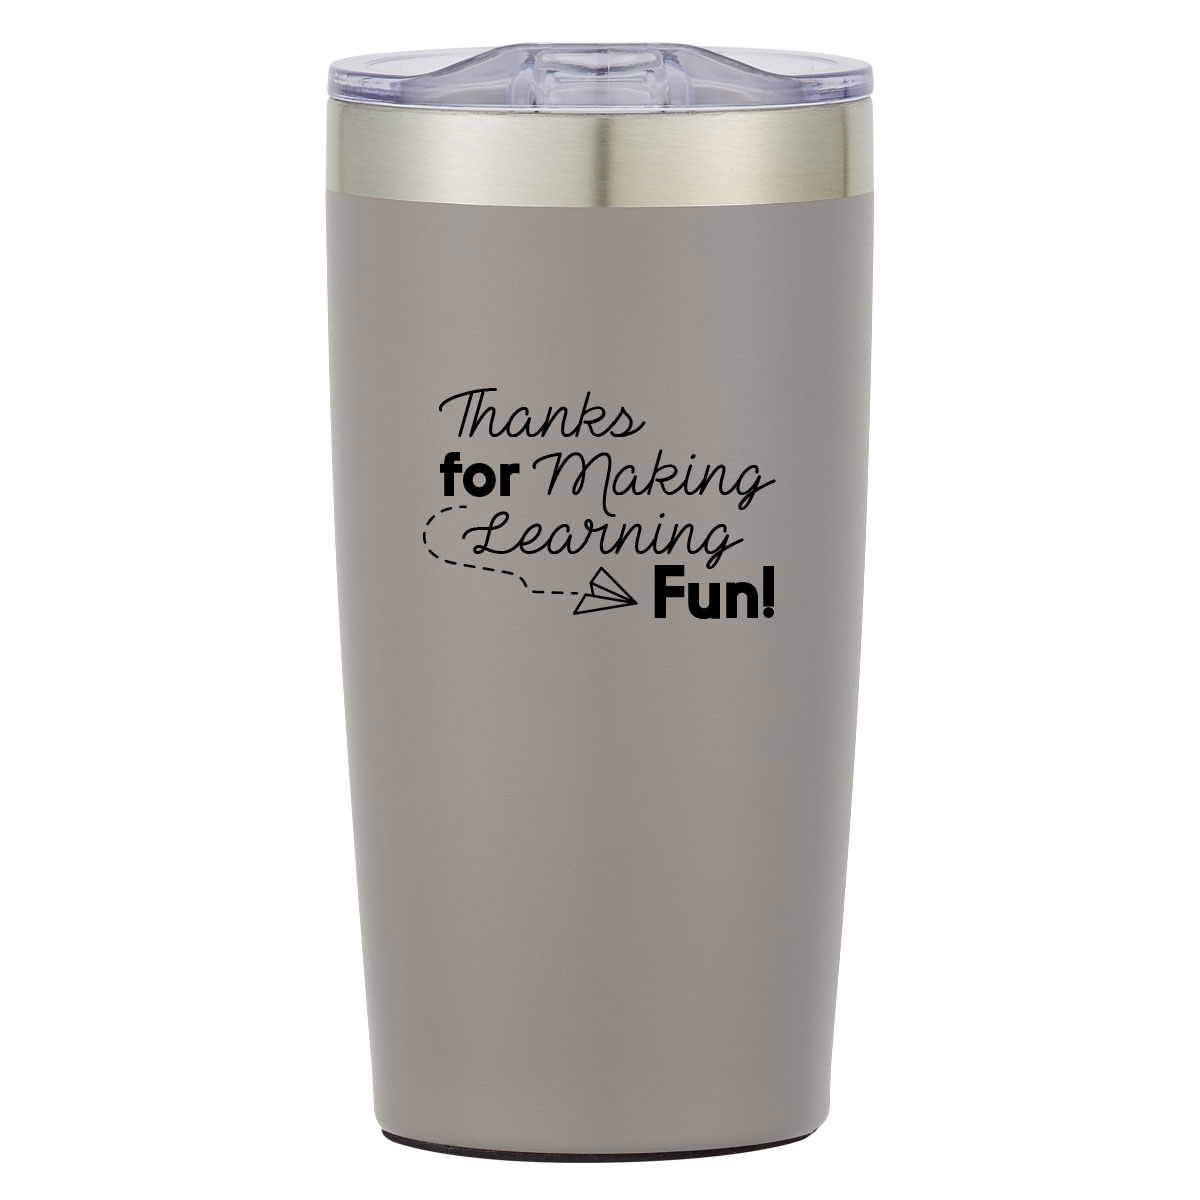 Insulated travel mug with teacher appreciation quote